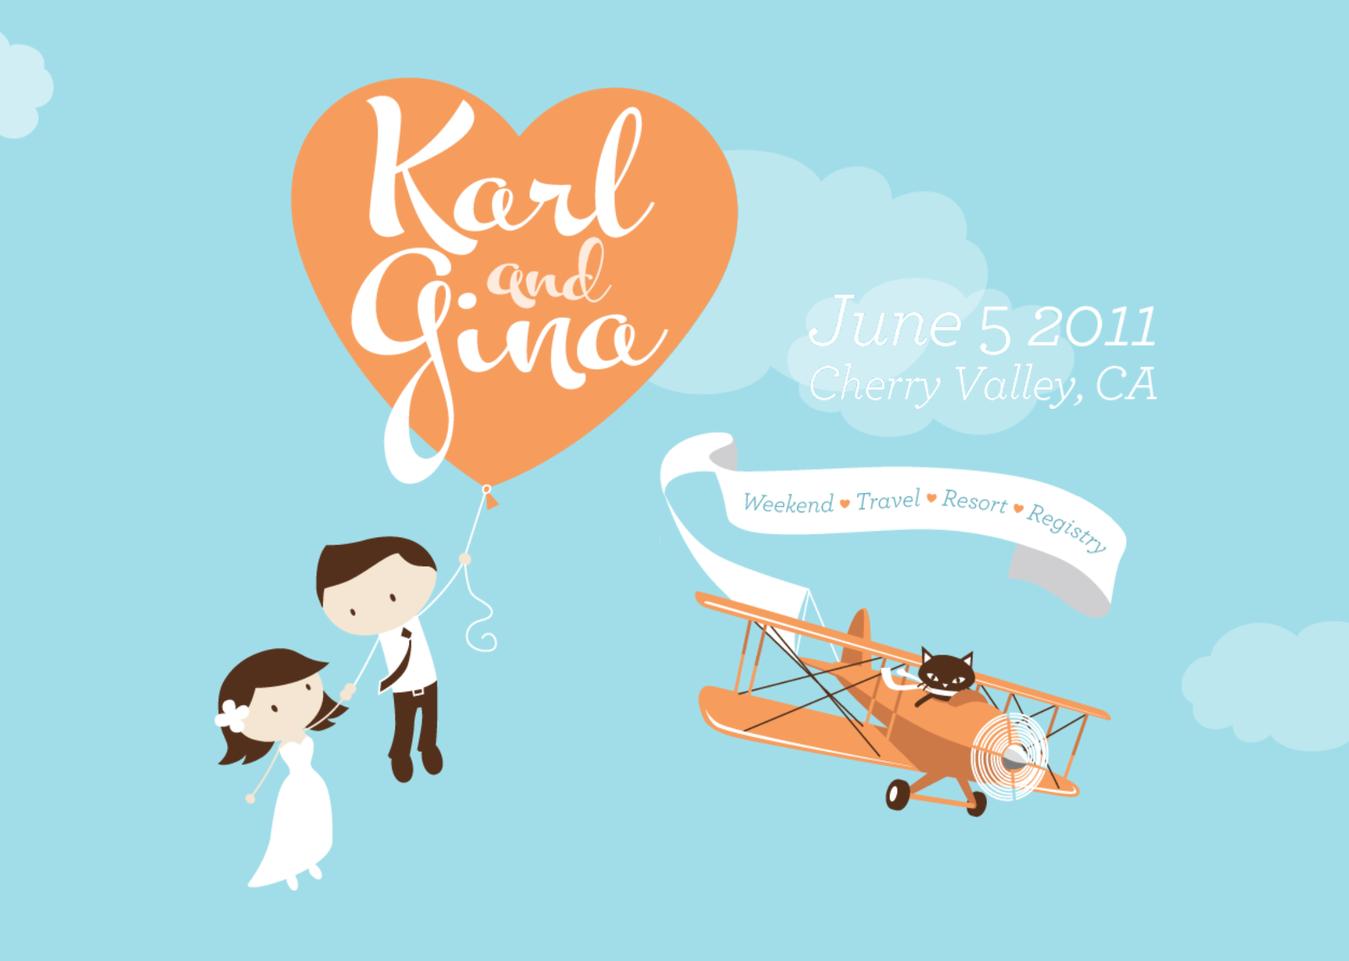 Karl dan Gina